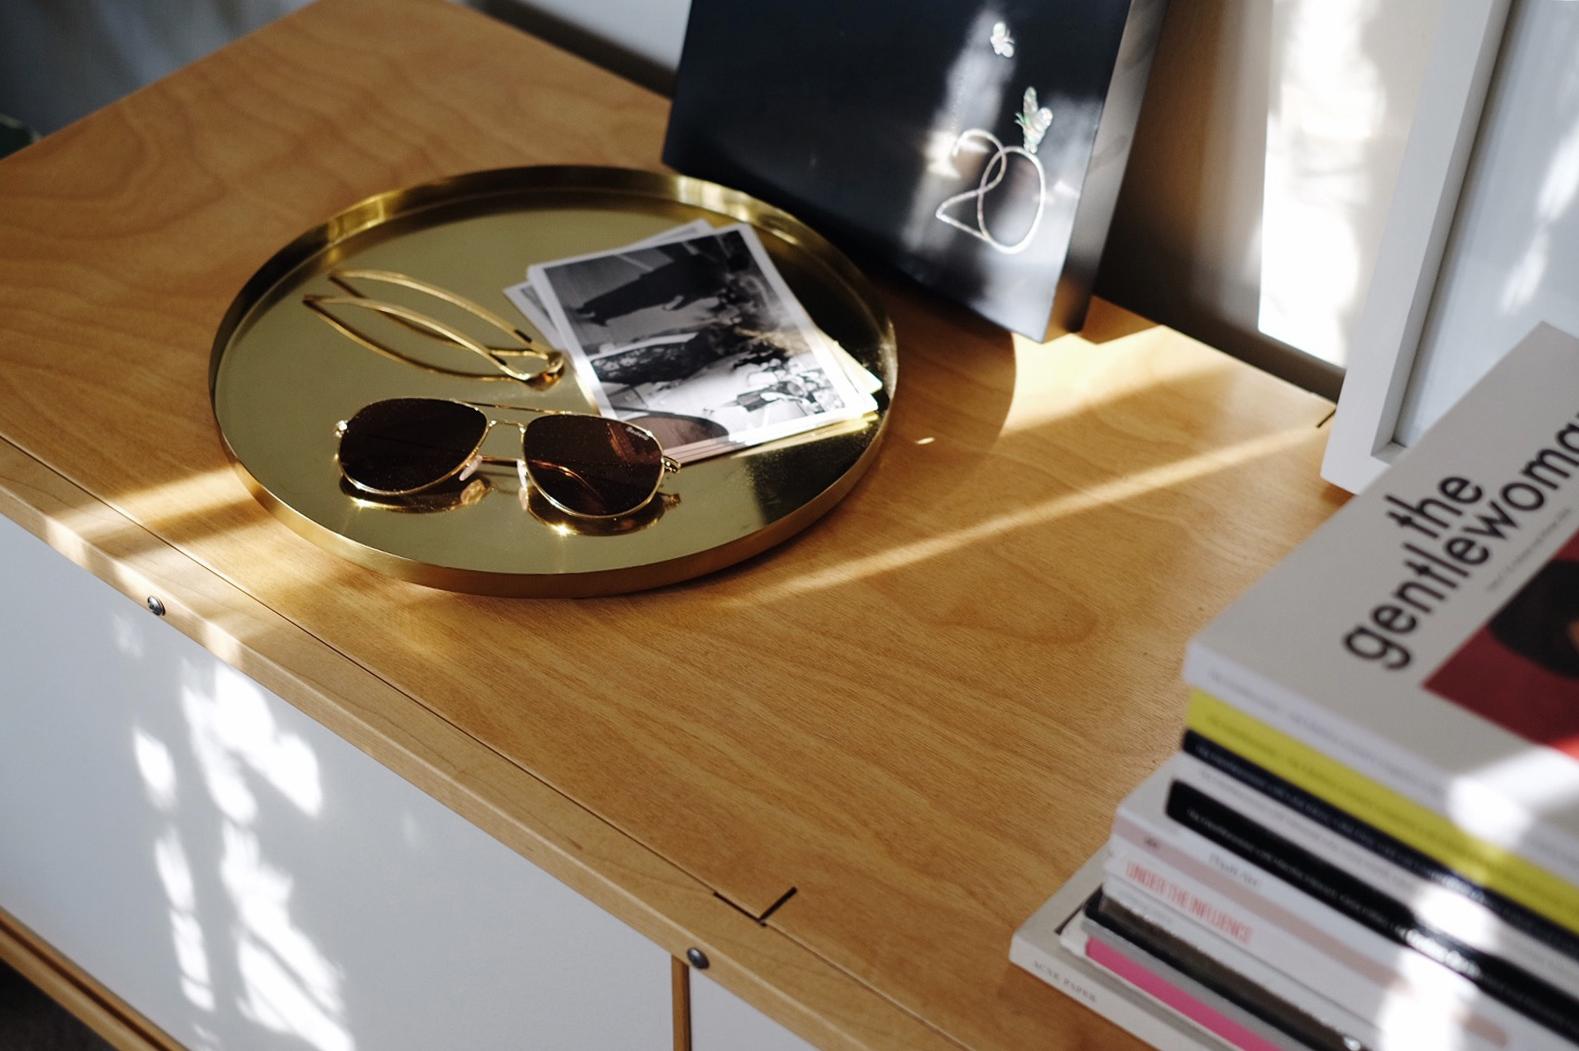 ILLESTEVA   Sunglasses  (More   here  ) / SYLVAIN LE HEN  Hair Pin